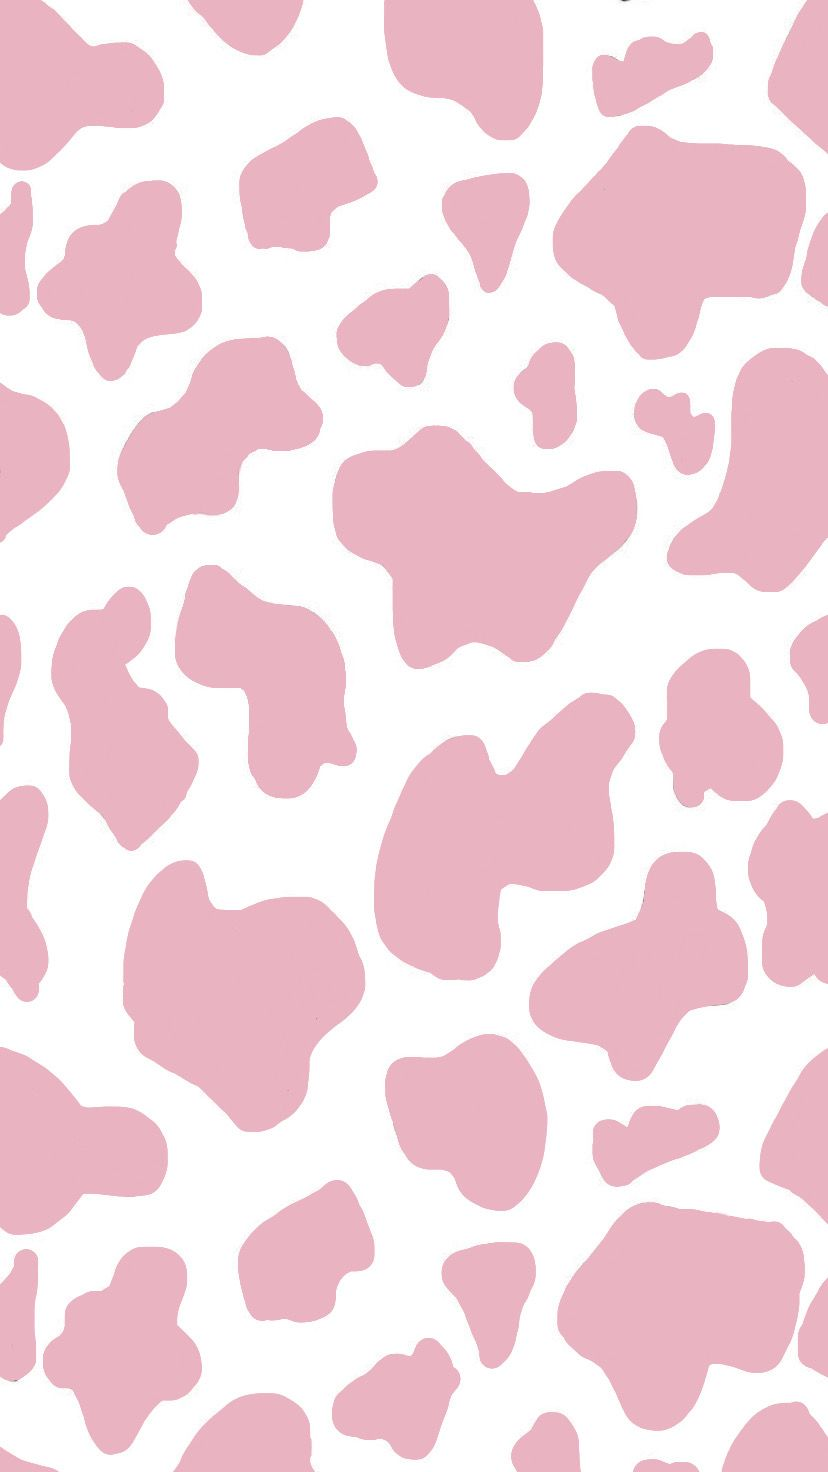 Pink Cow Print Alisakolesnyk Wallpaper Cow Pink In 2020 Cow Print Wallpaper Edgy Wallpaper Cute Patterns Wallpaper